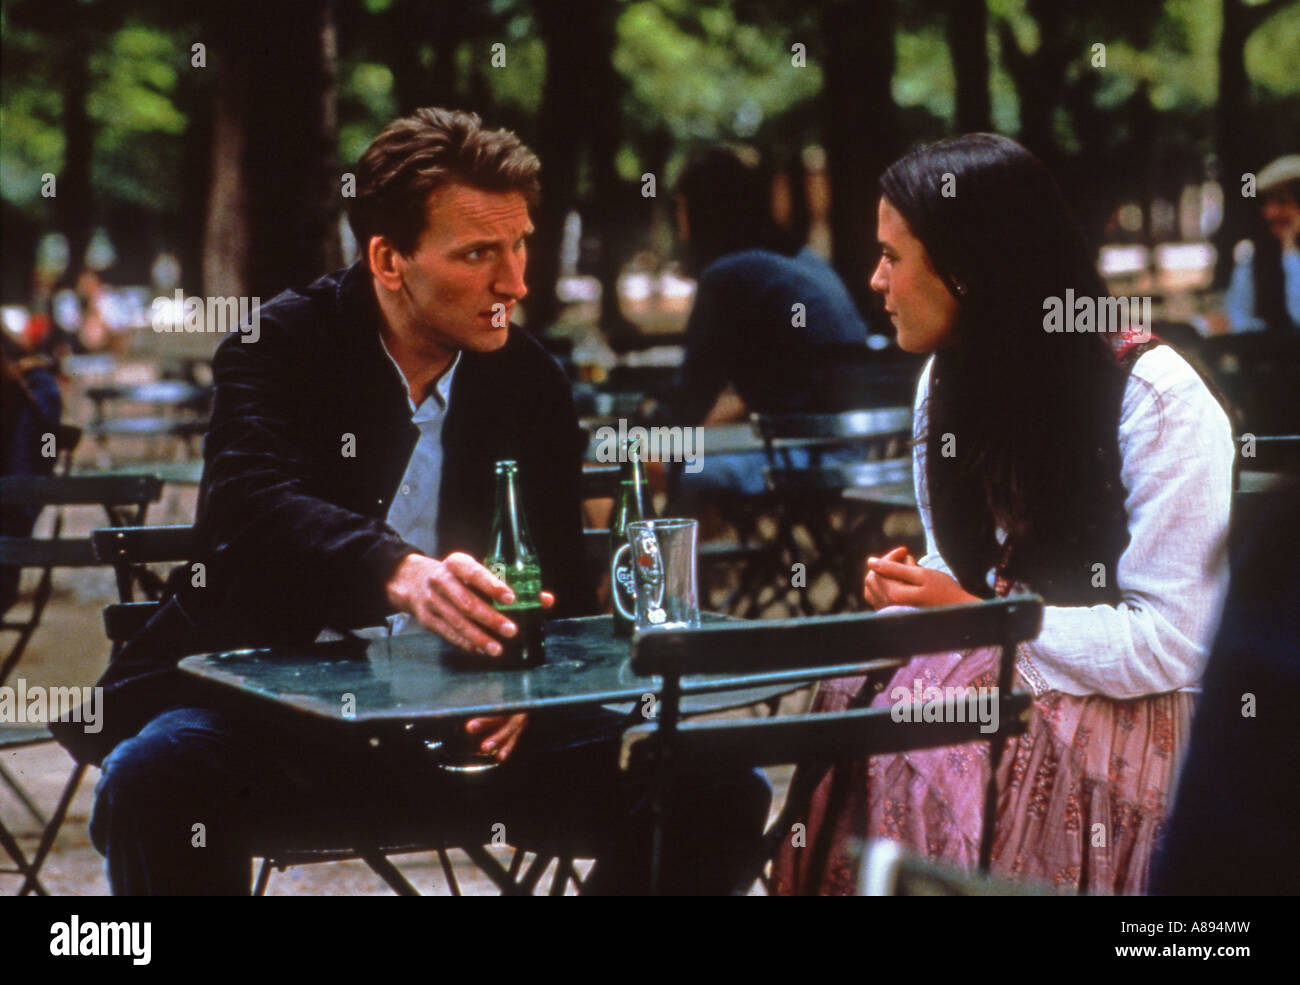 INVISIBLE CIRCUS 2001 Entertainment/Fine Line Film mit Christopher Ecclestone und Jordana Brewster Stockbild